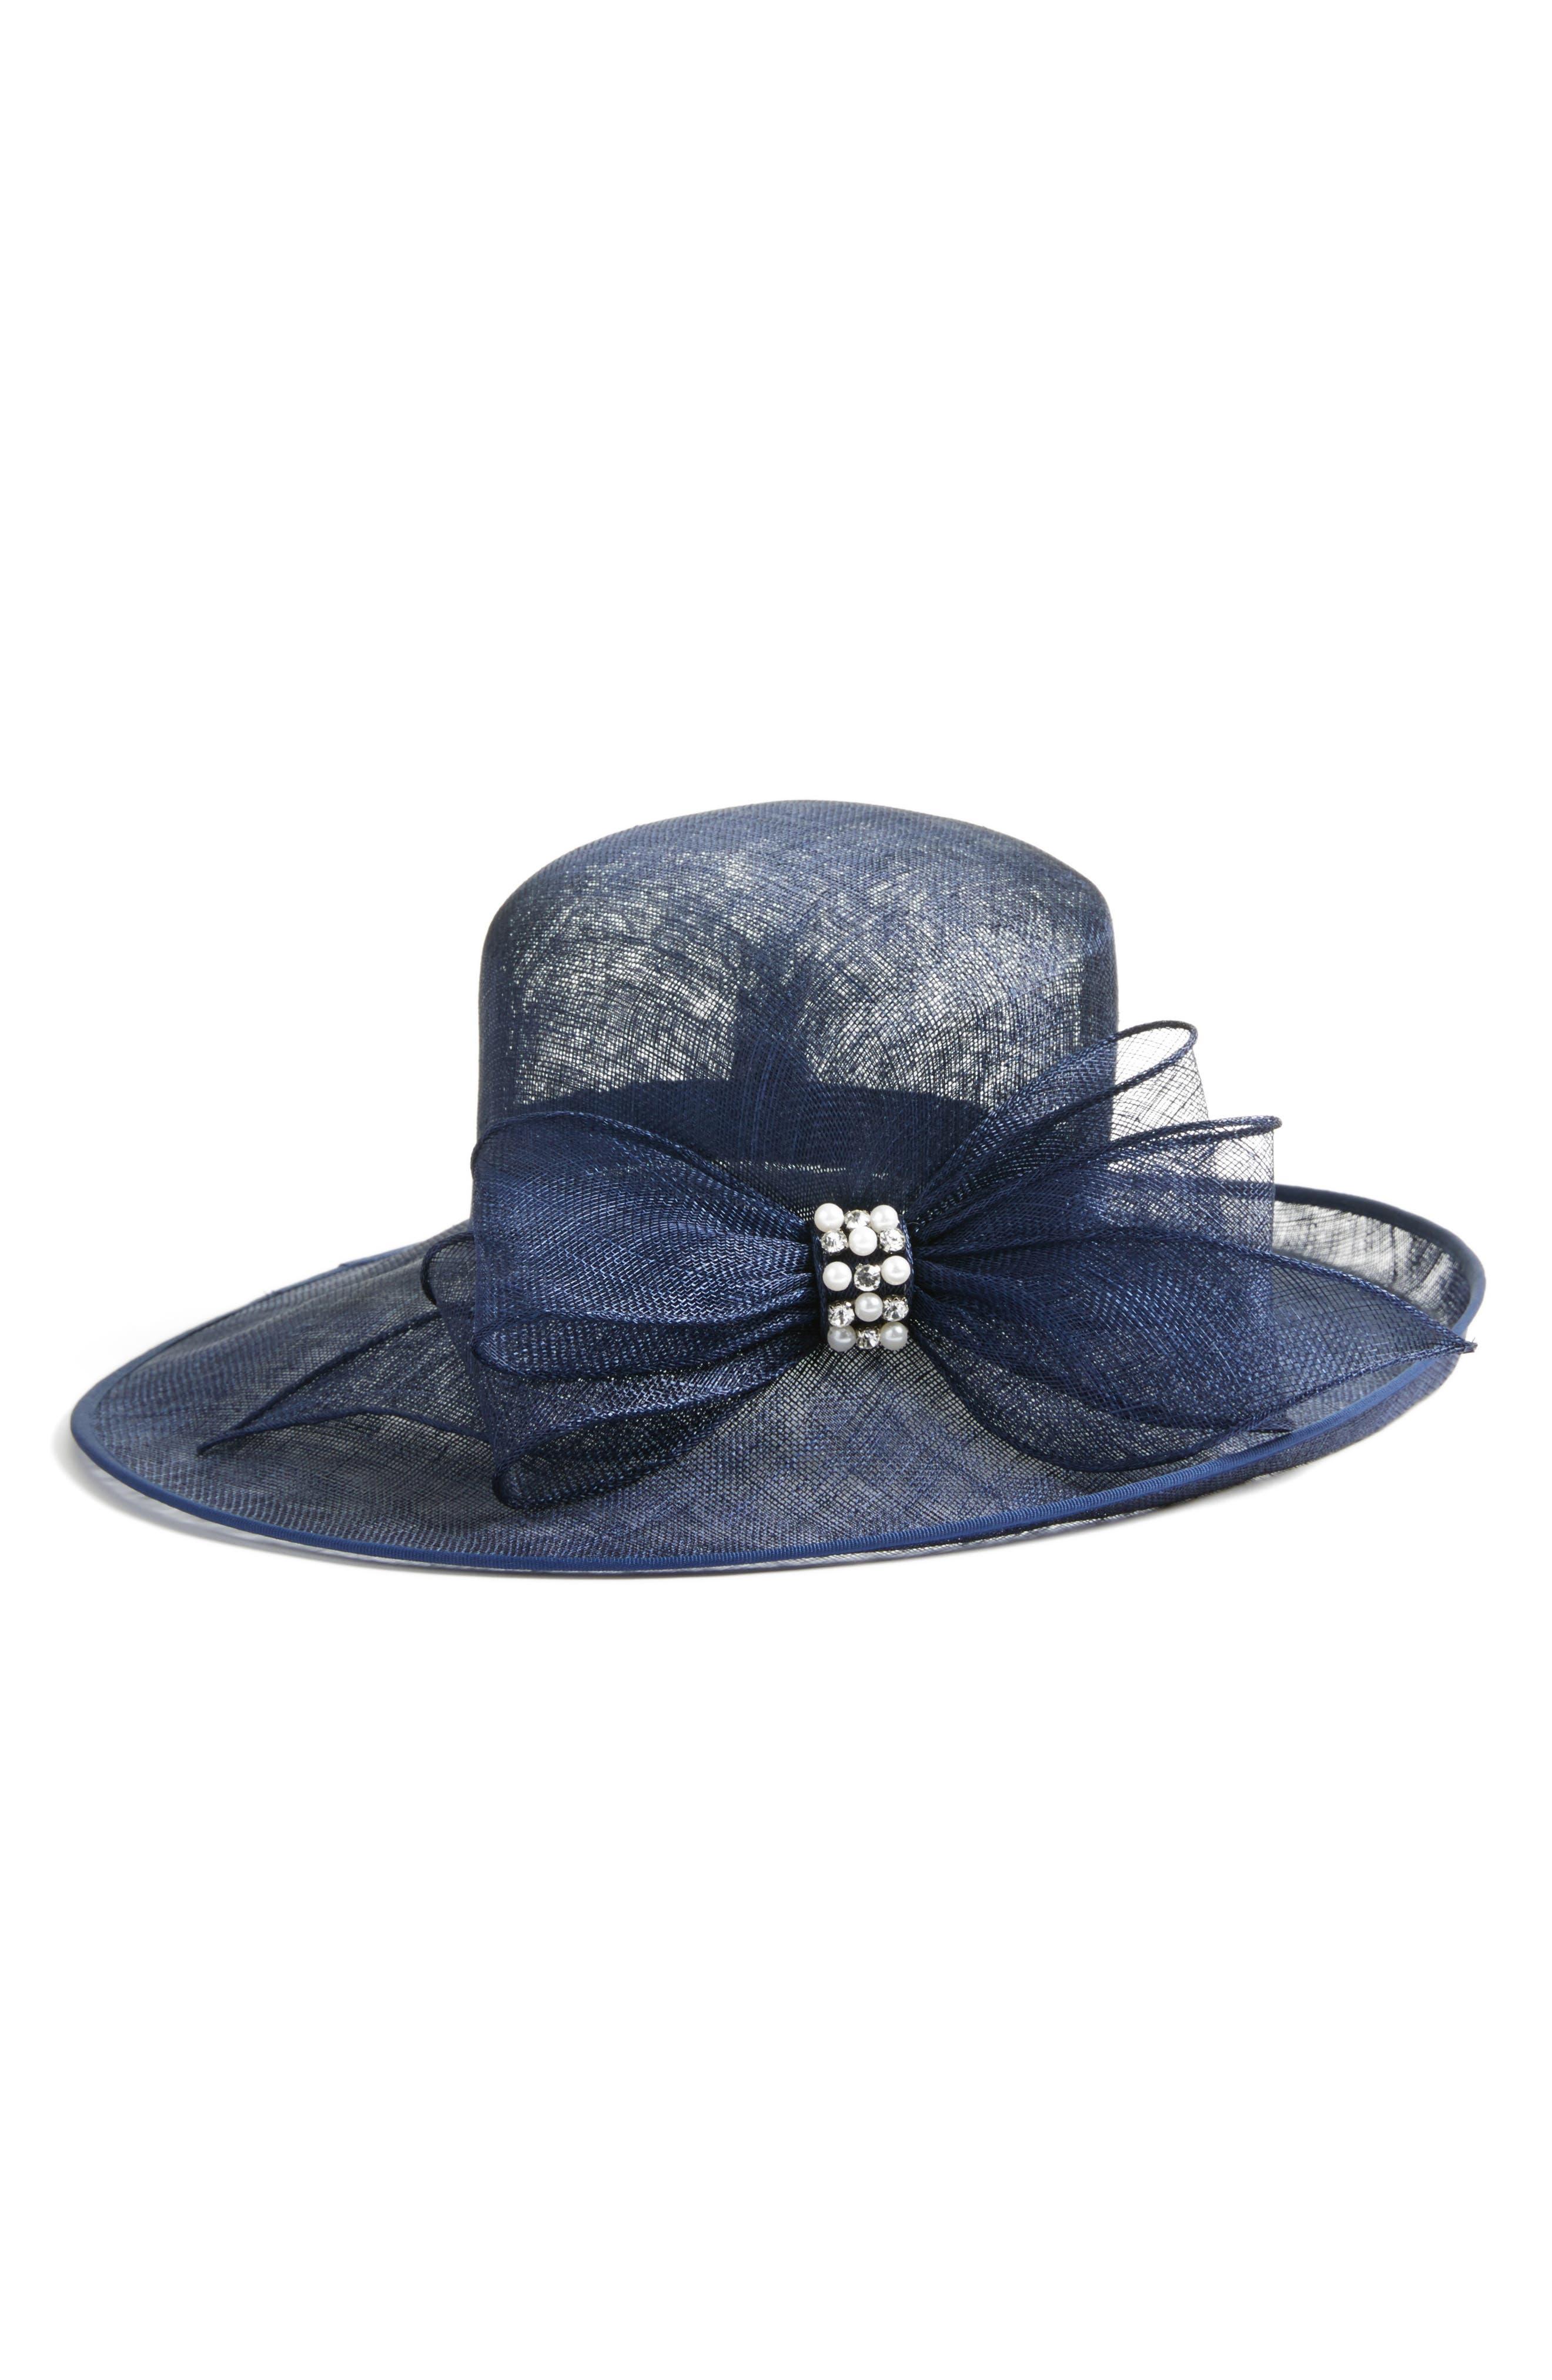 Jeweled Bow Hat,                             Main thumbnail 1, color,                             401